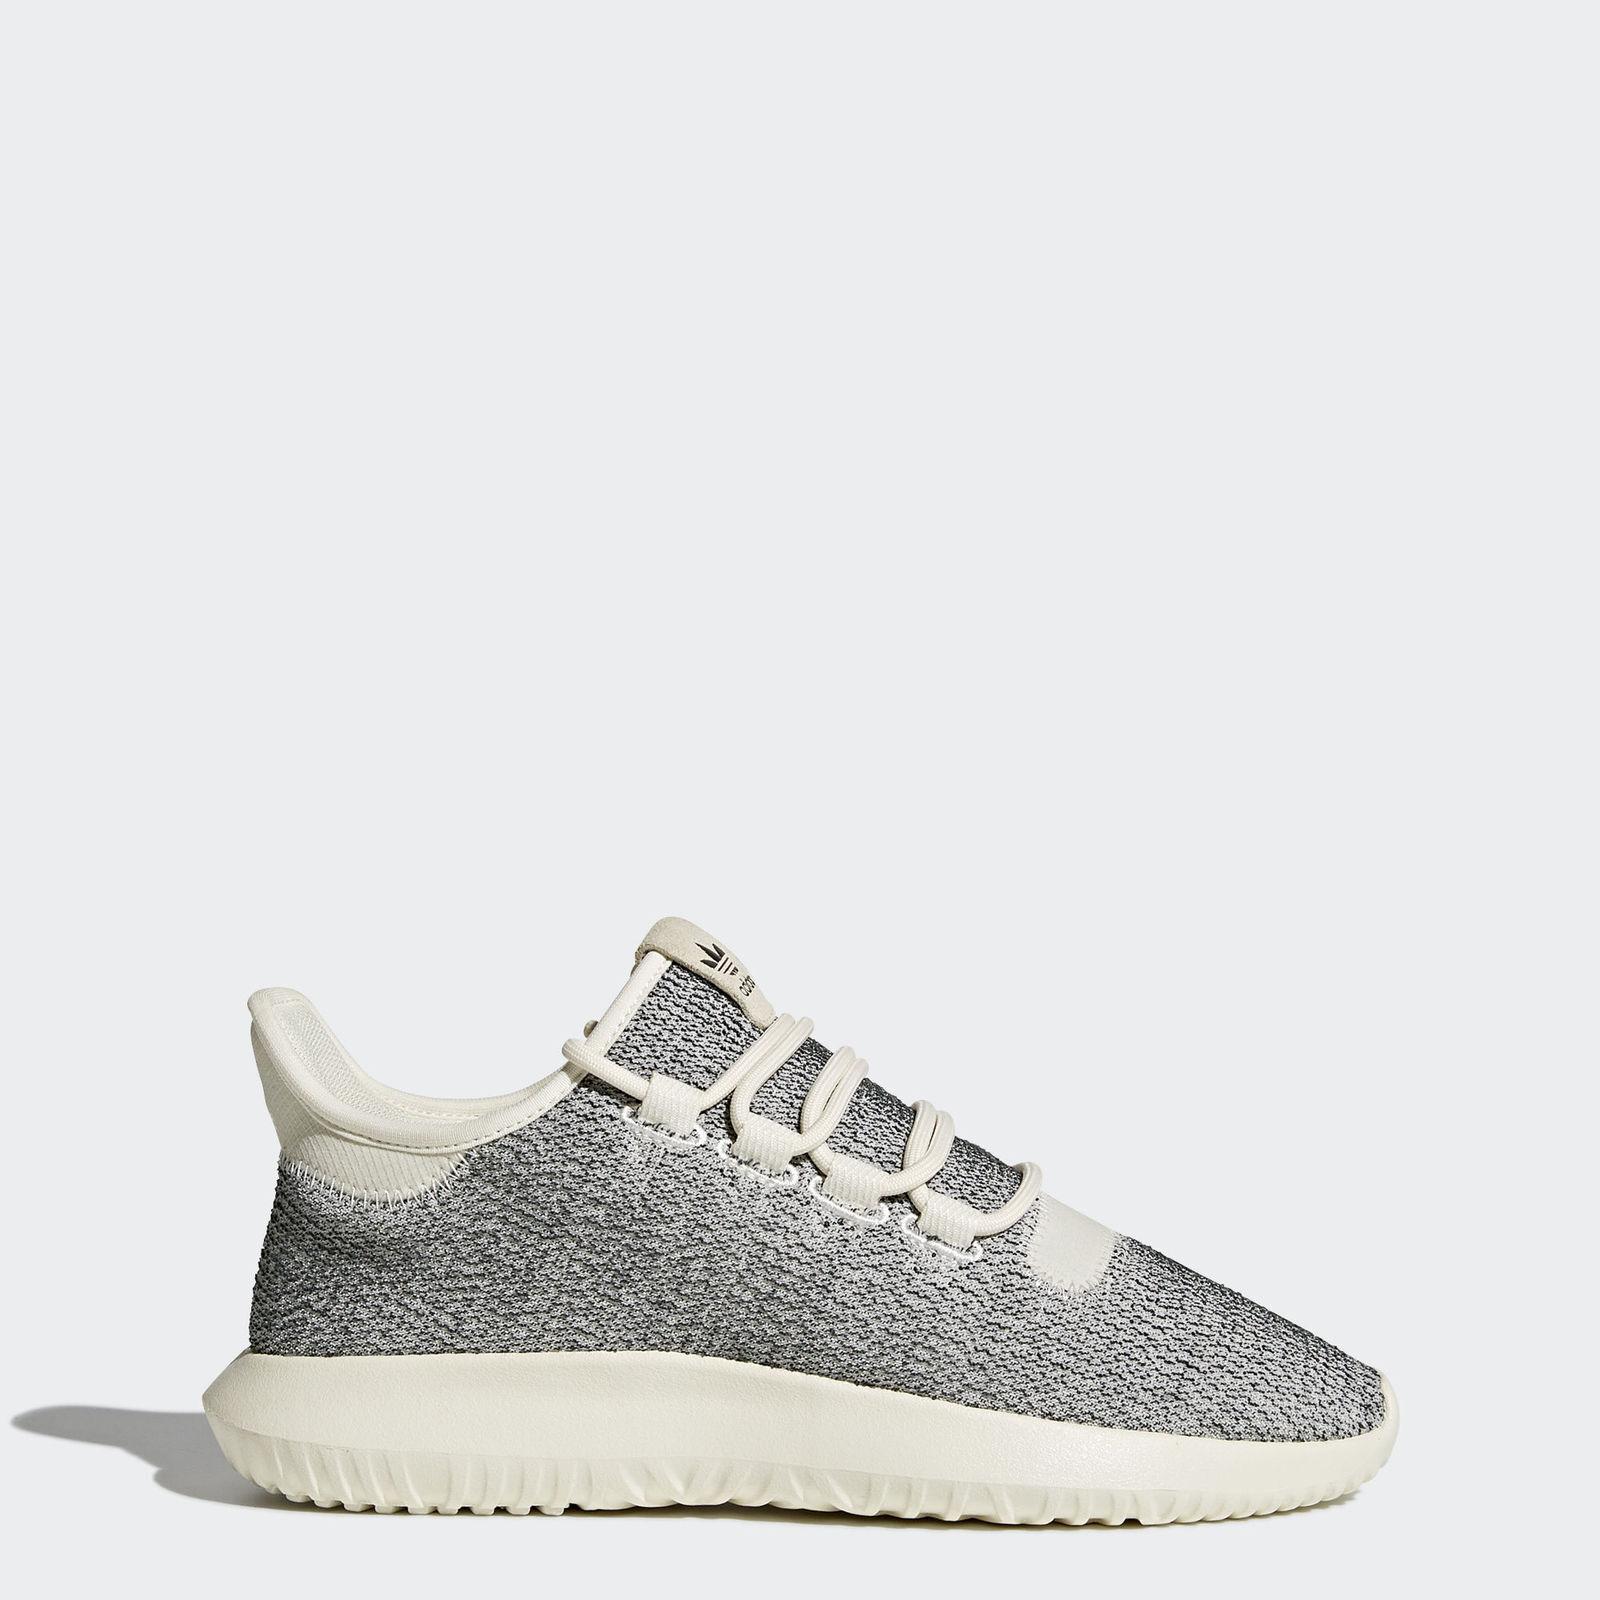 NEW Women's Adidas Tubular Shadow Shoes Comfortable